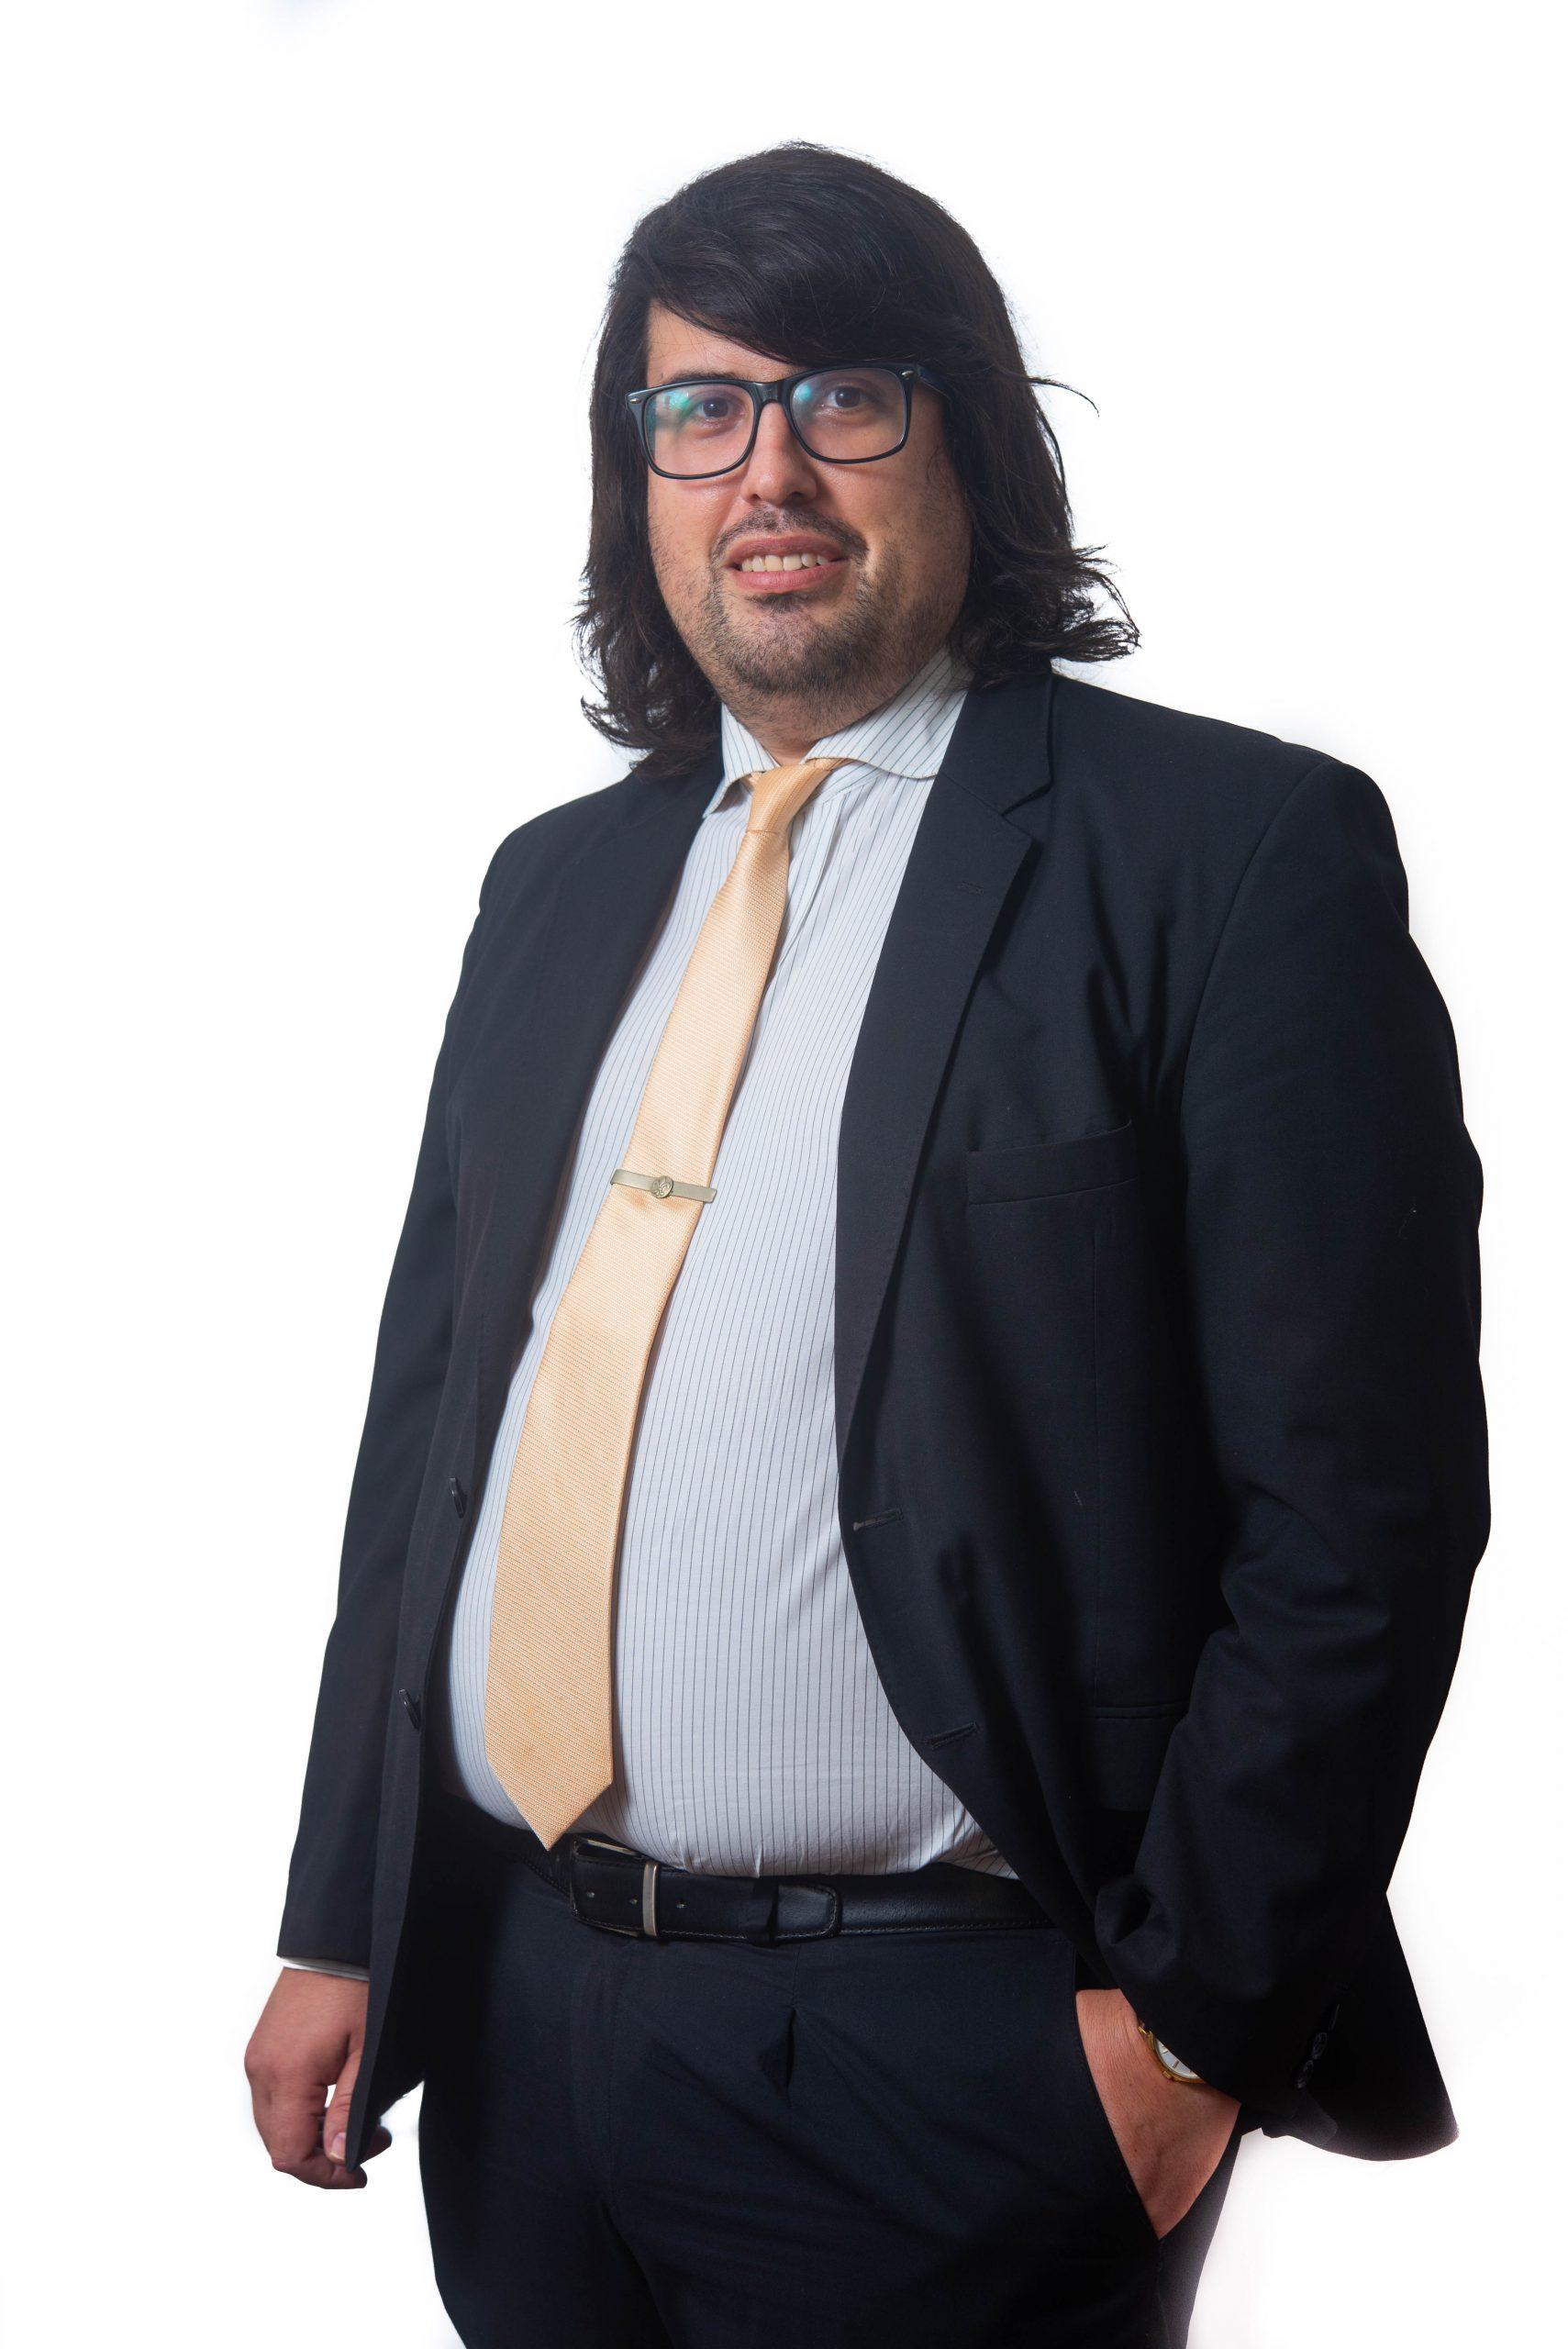 Leandro Miguel Vence